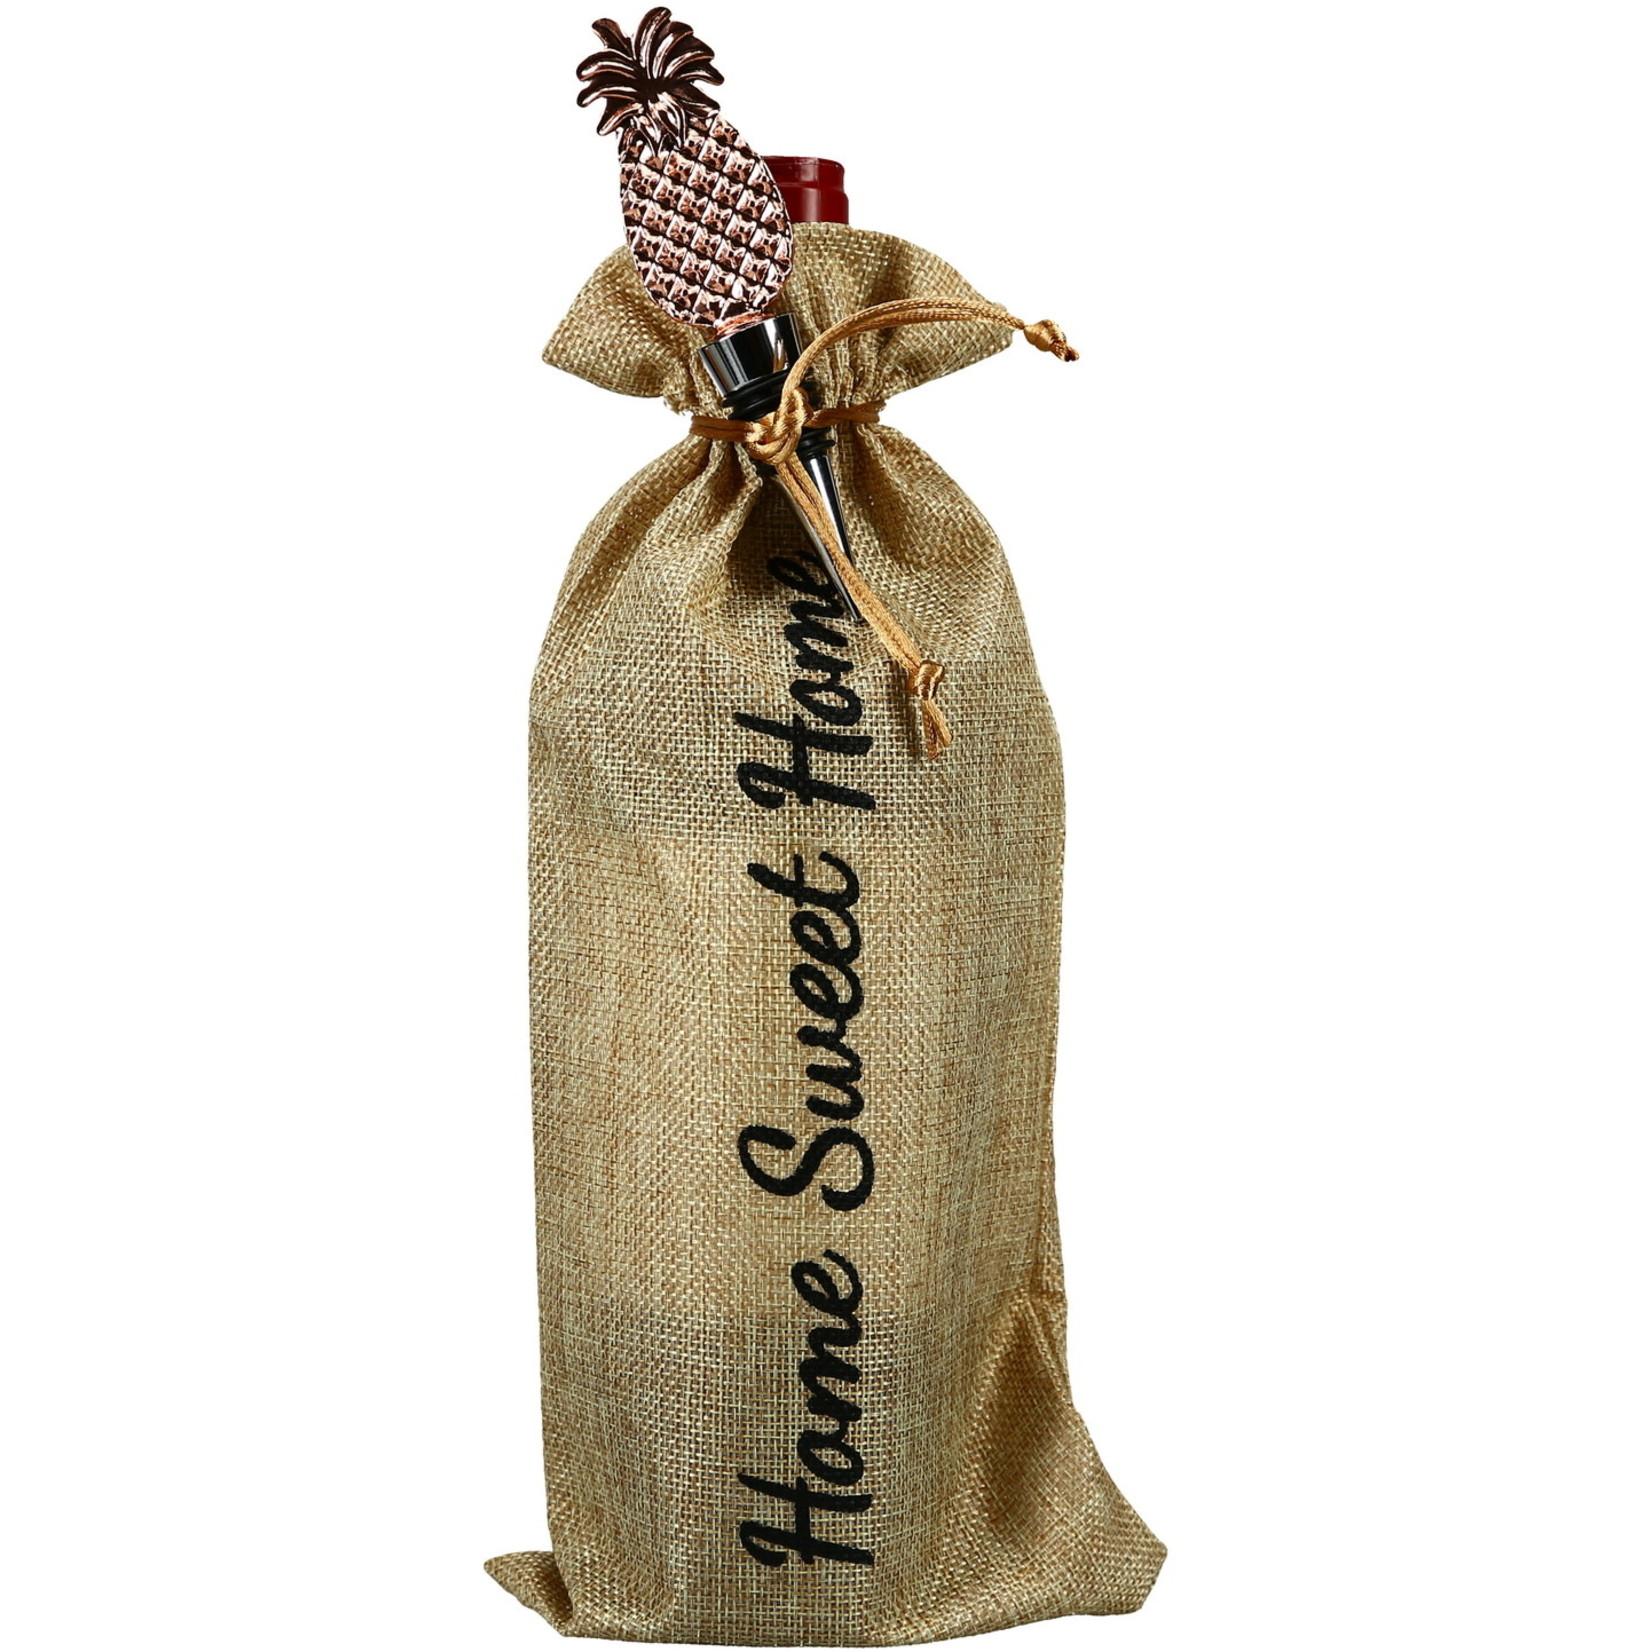 Pavilion Gift Co. Barware: Home- Wine Gift Bag Set